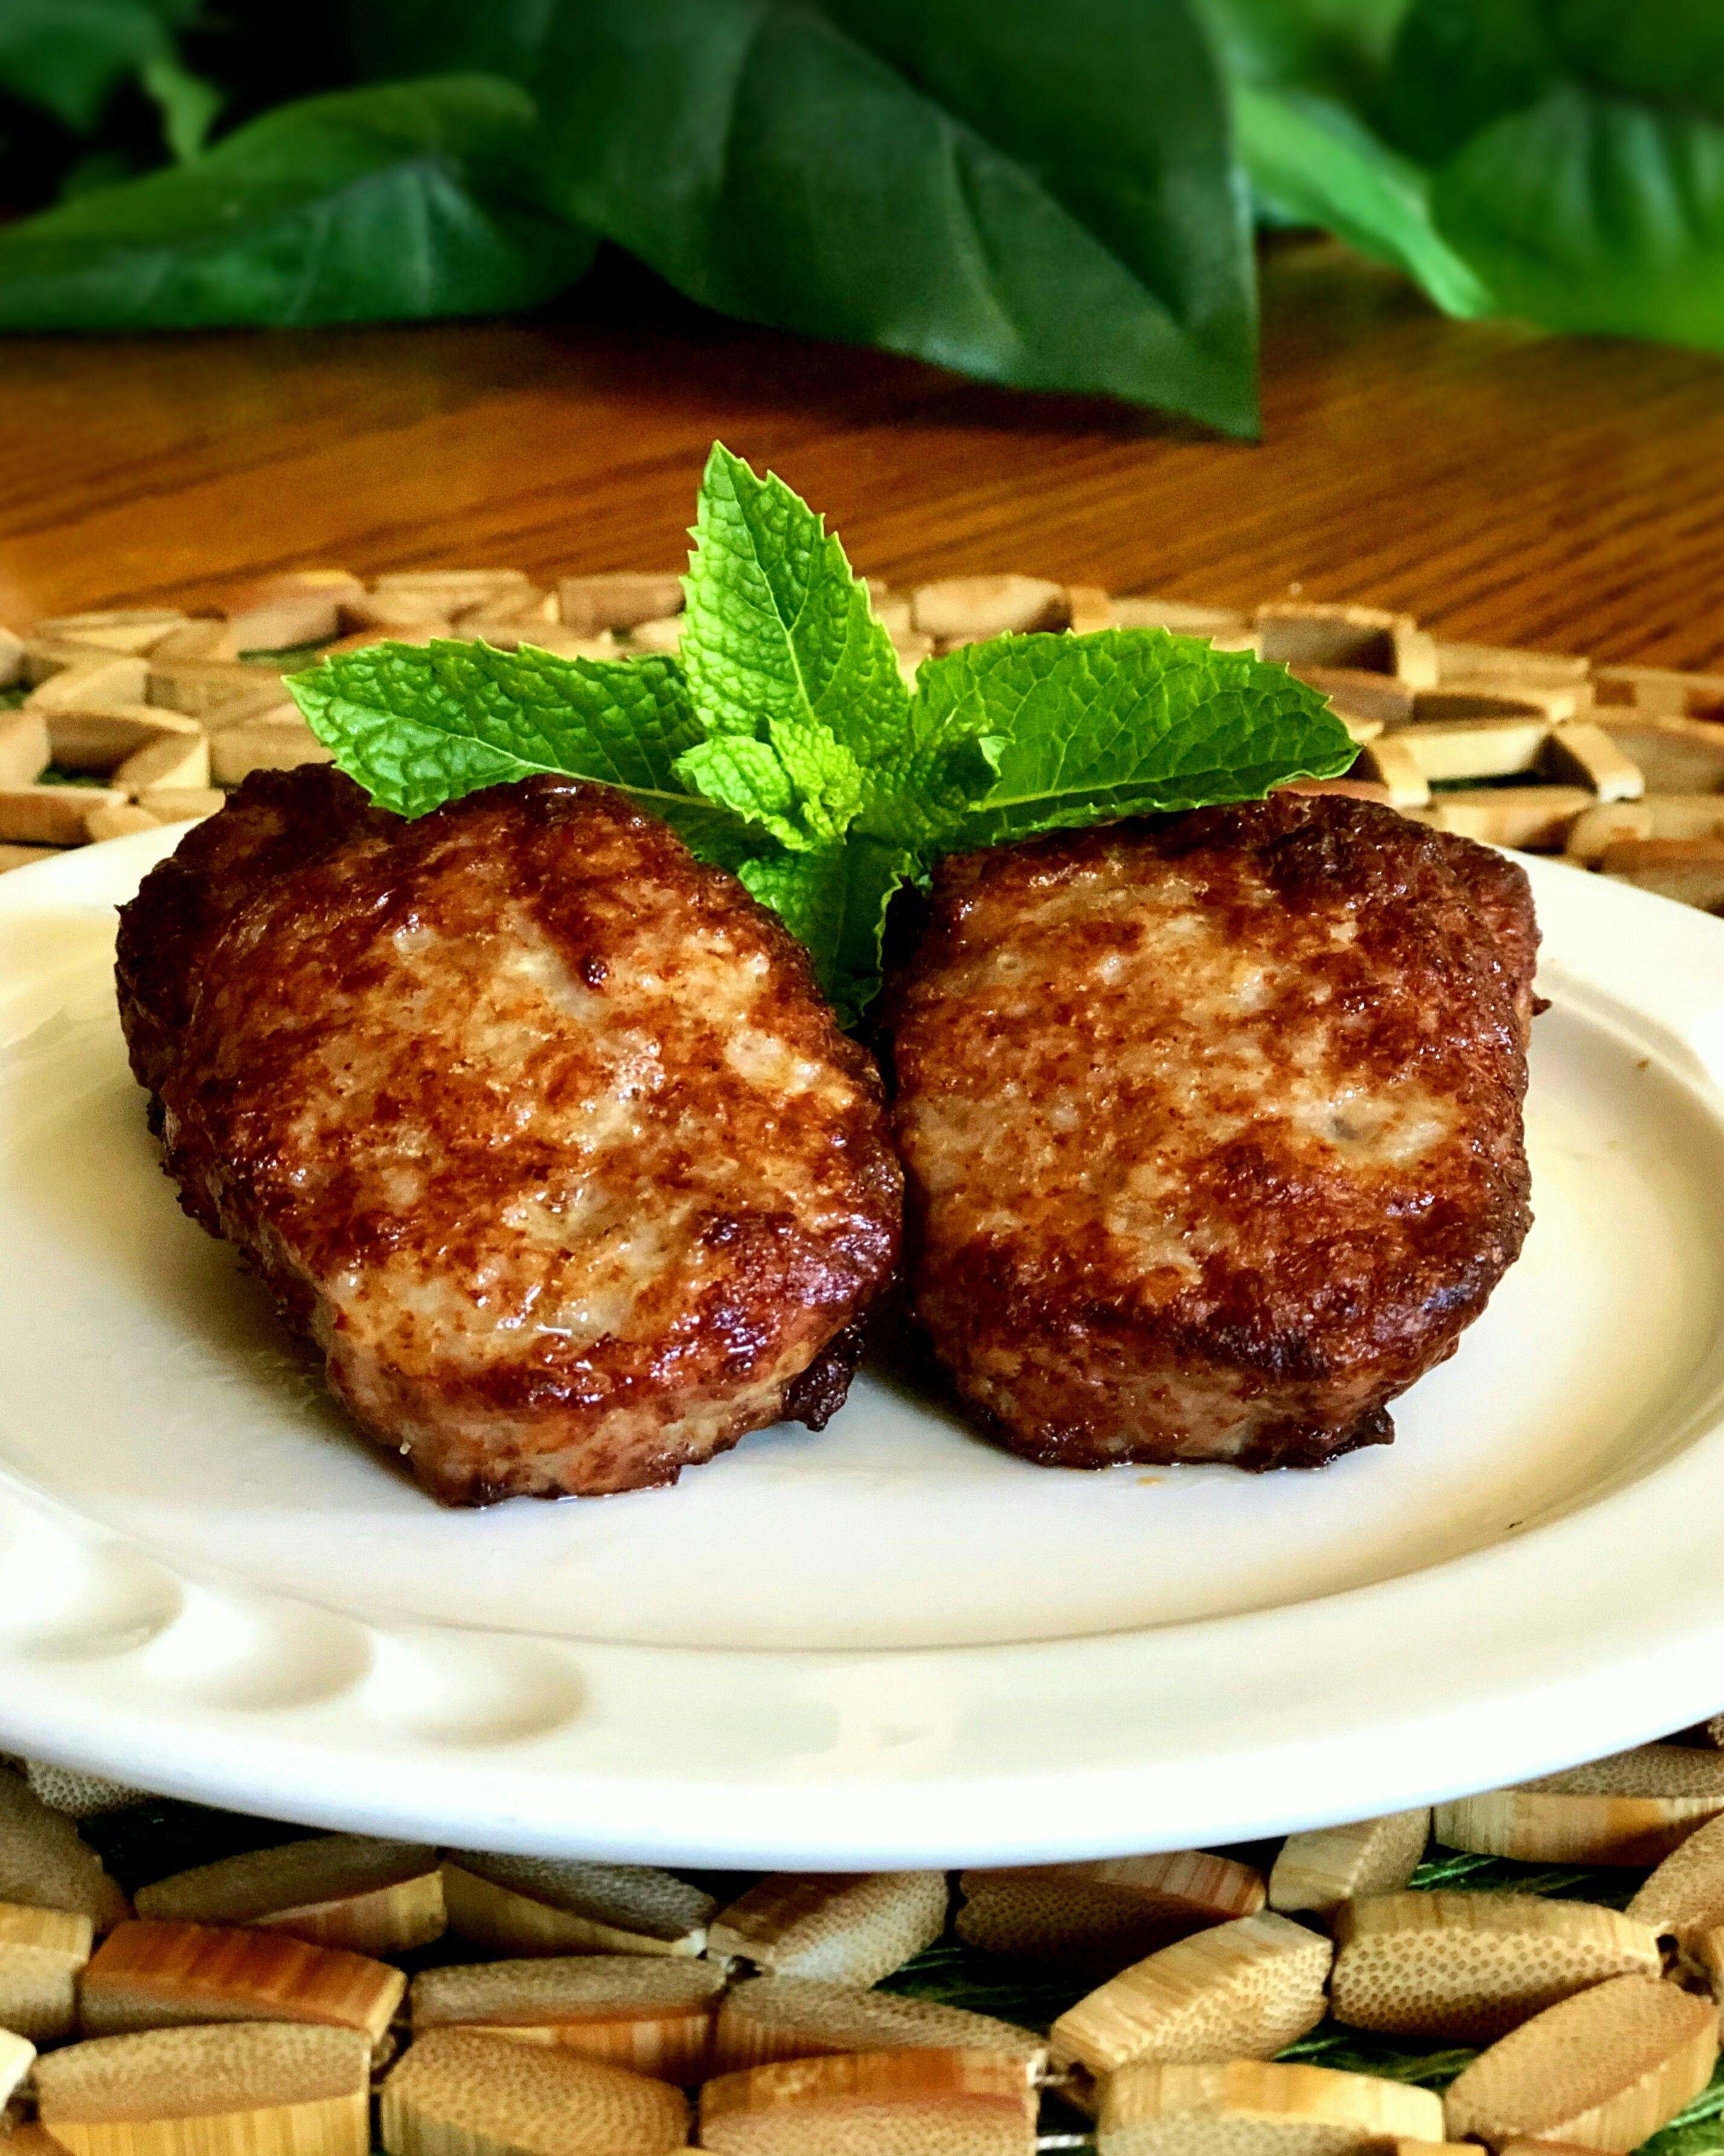 Air fryer sausage patties recipe air fryer recipes